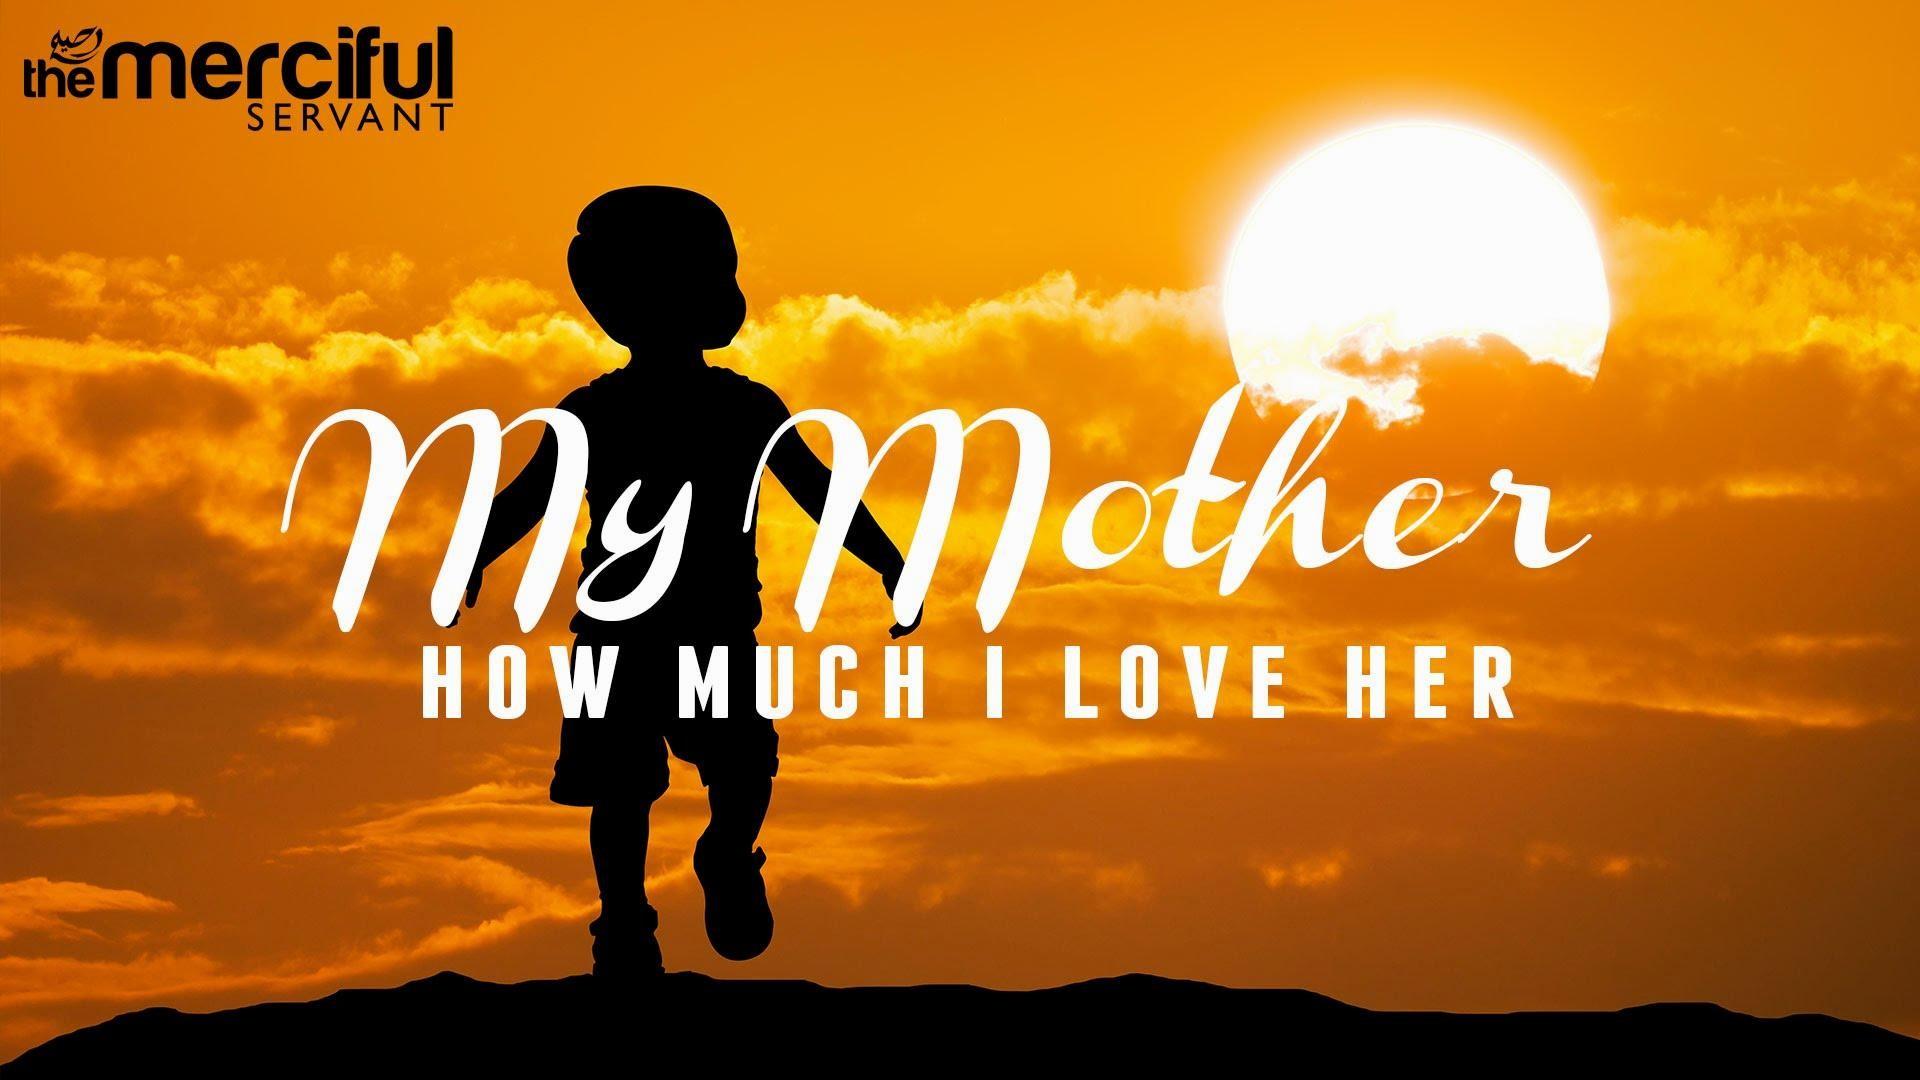 I-Love-You-Mom-HD-Image